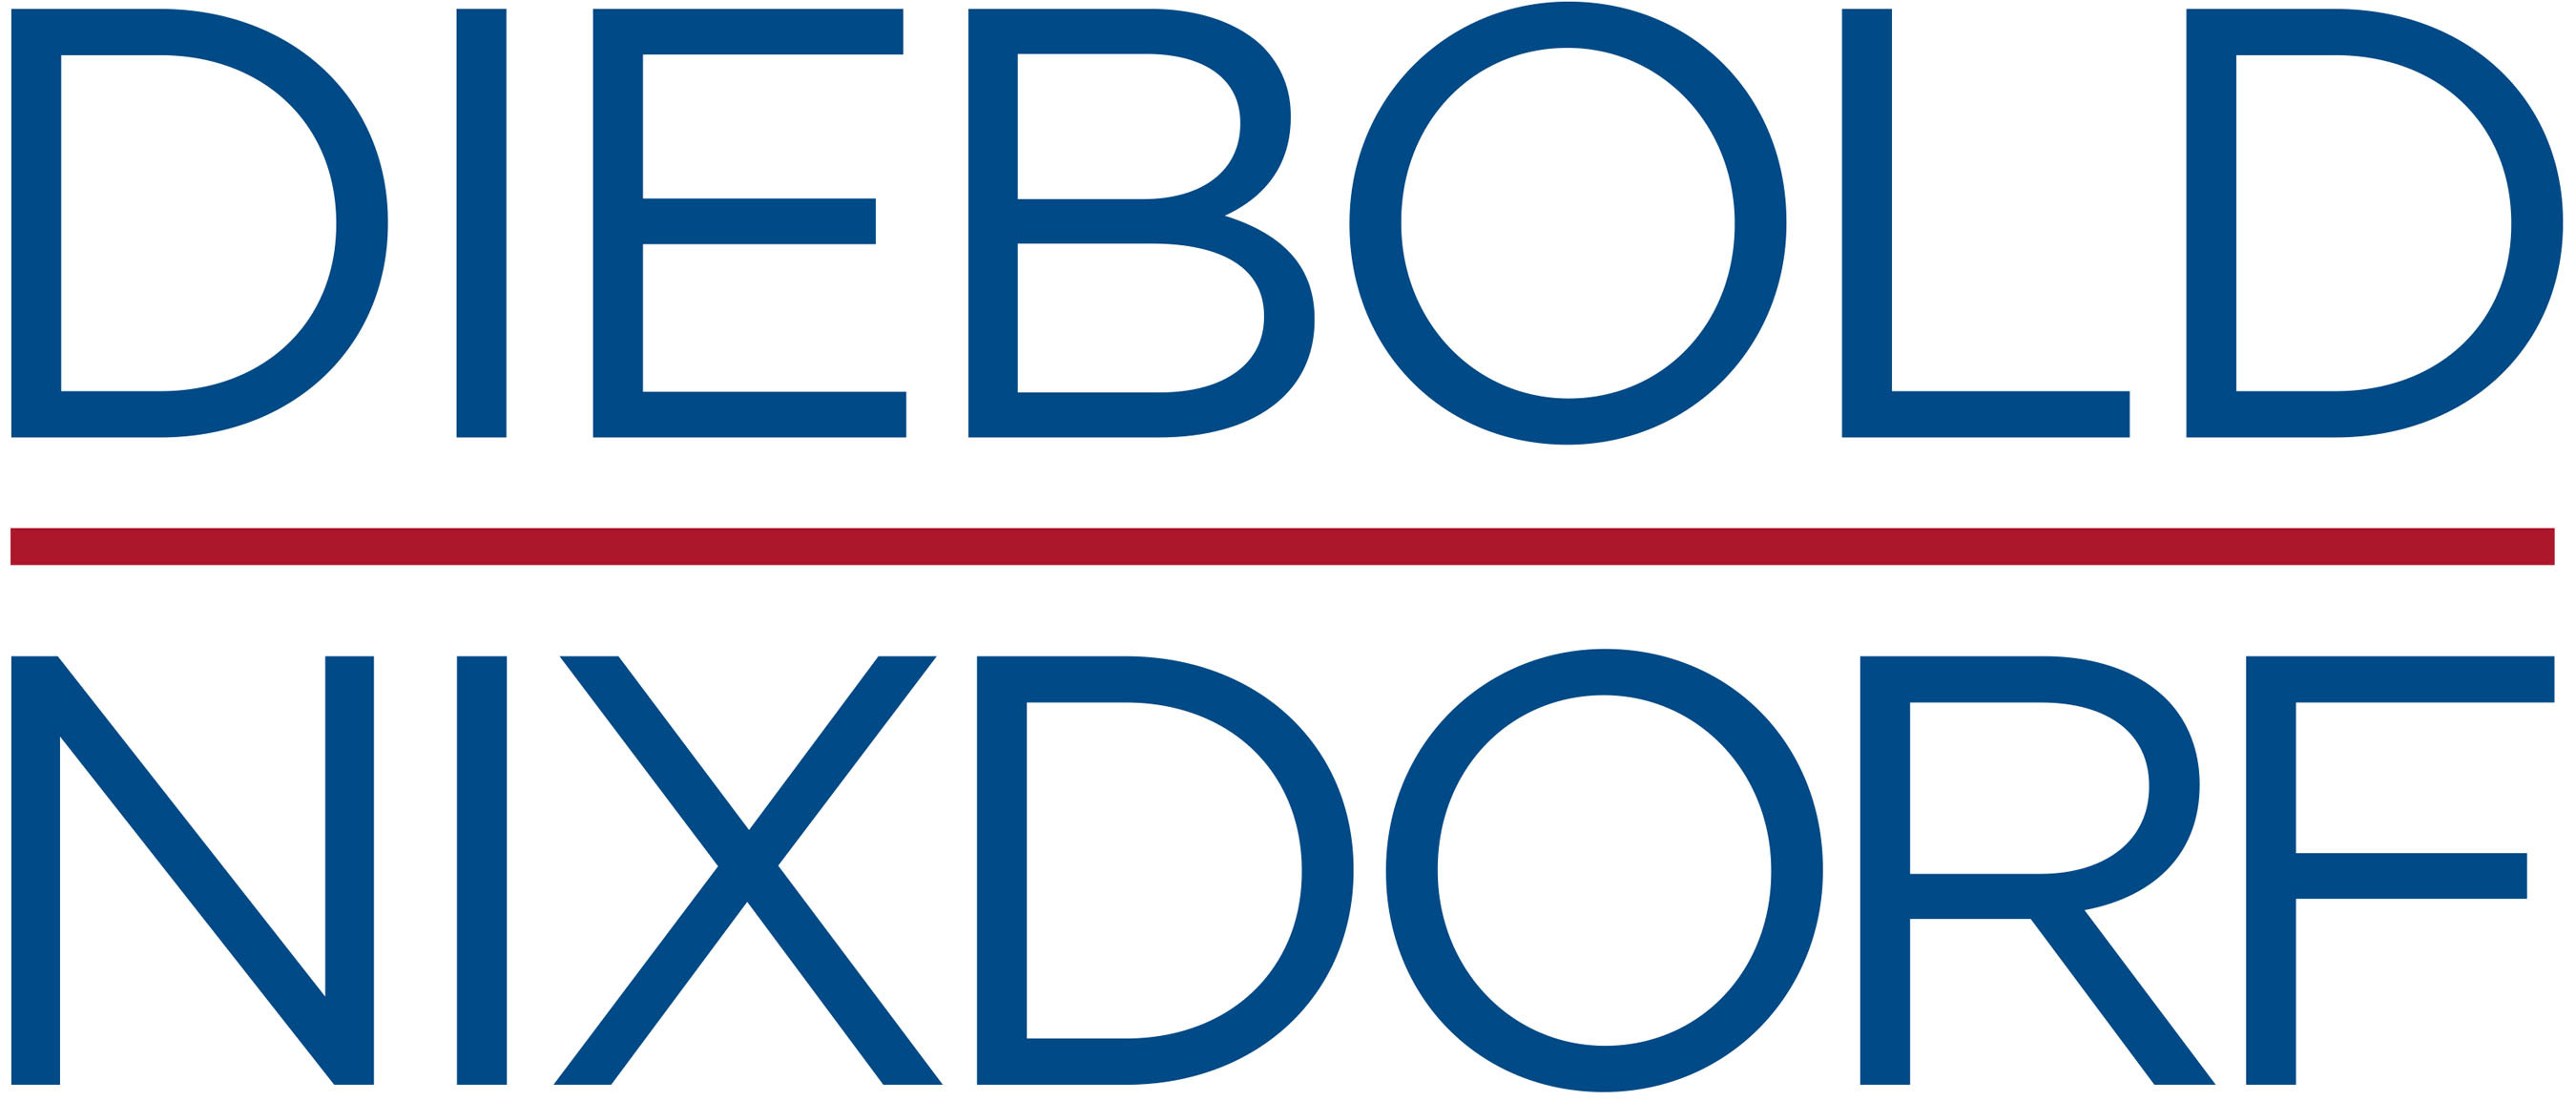 Diebold, Incorporated logo.